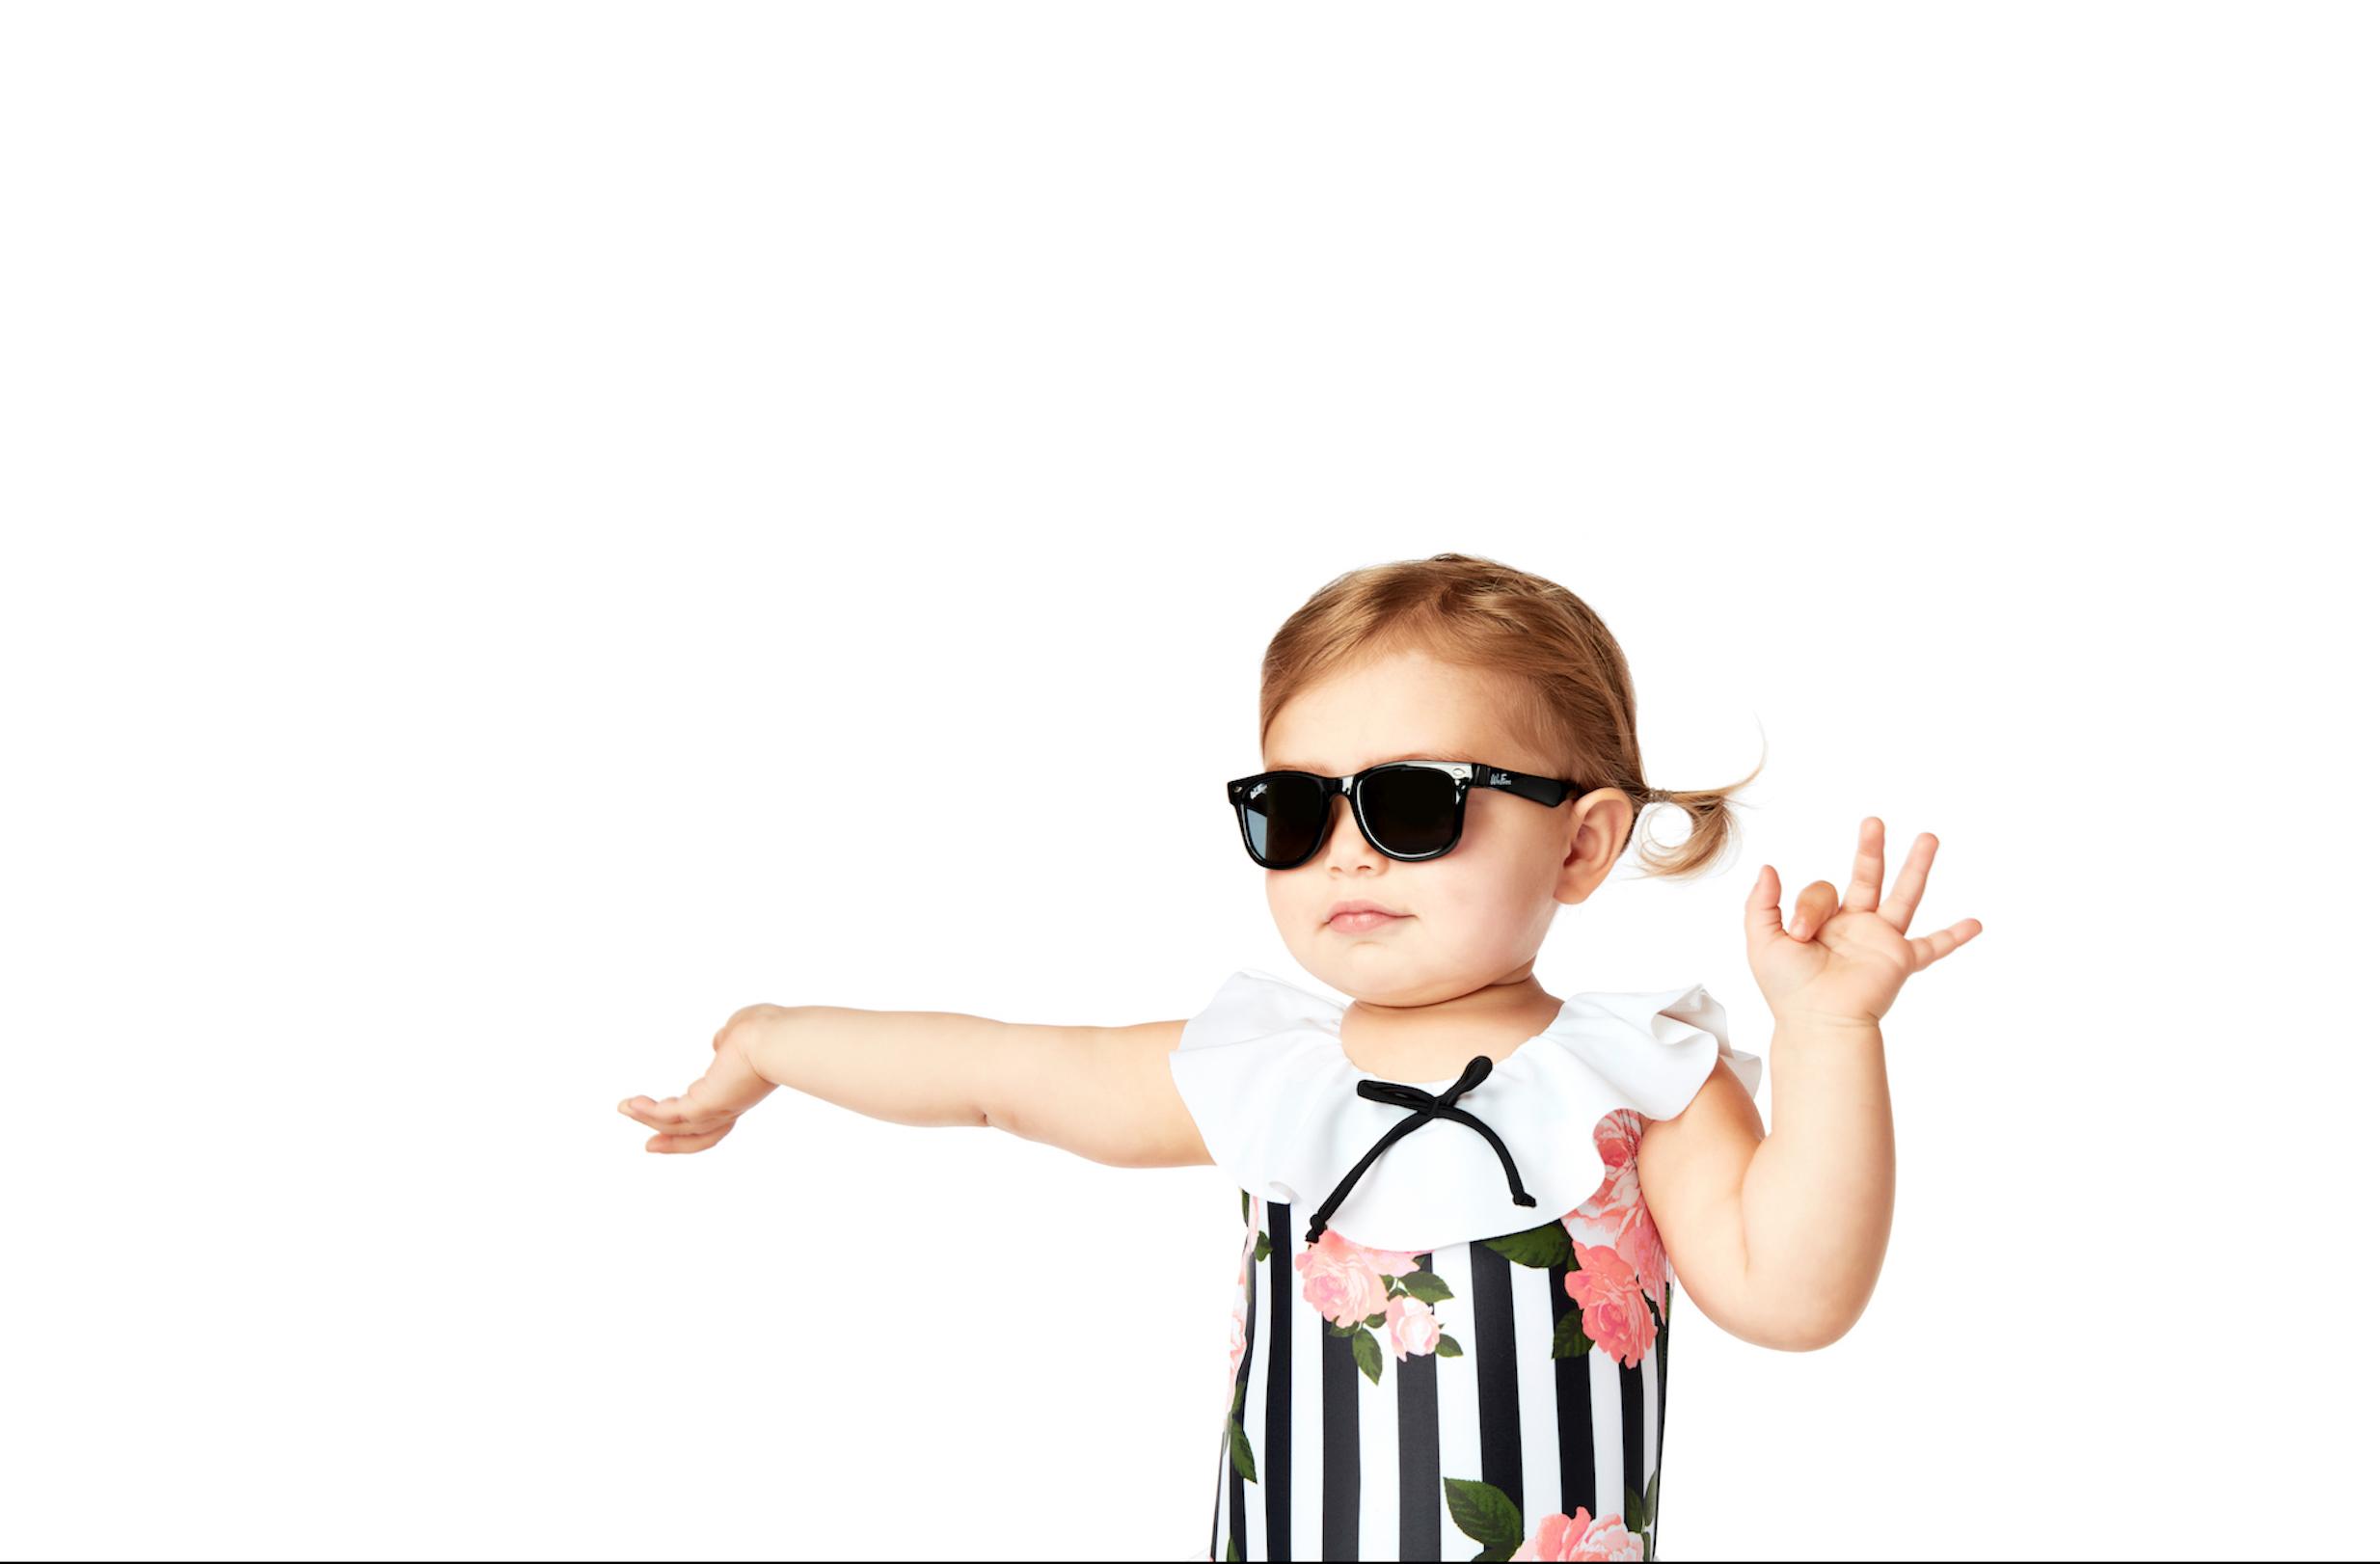 Colorful Classic Polarized Kids Sunglasses Boys Girls Children Toddler UV 100